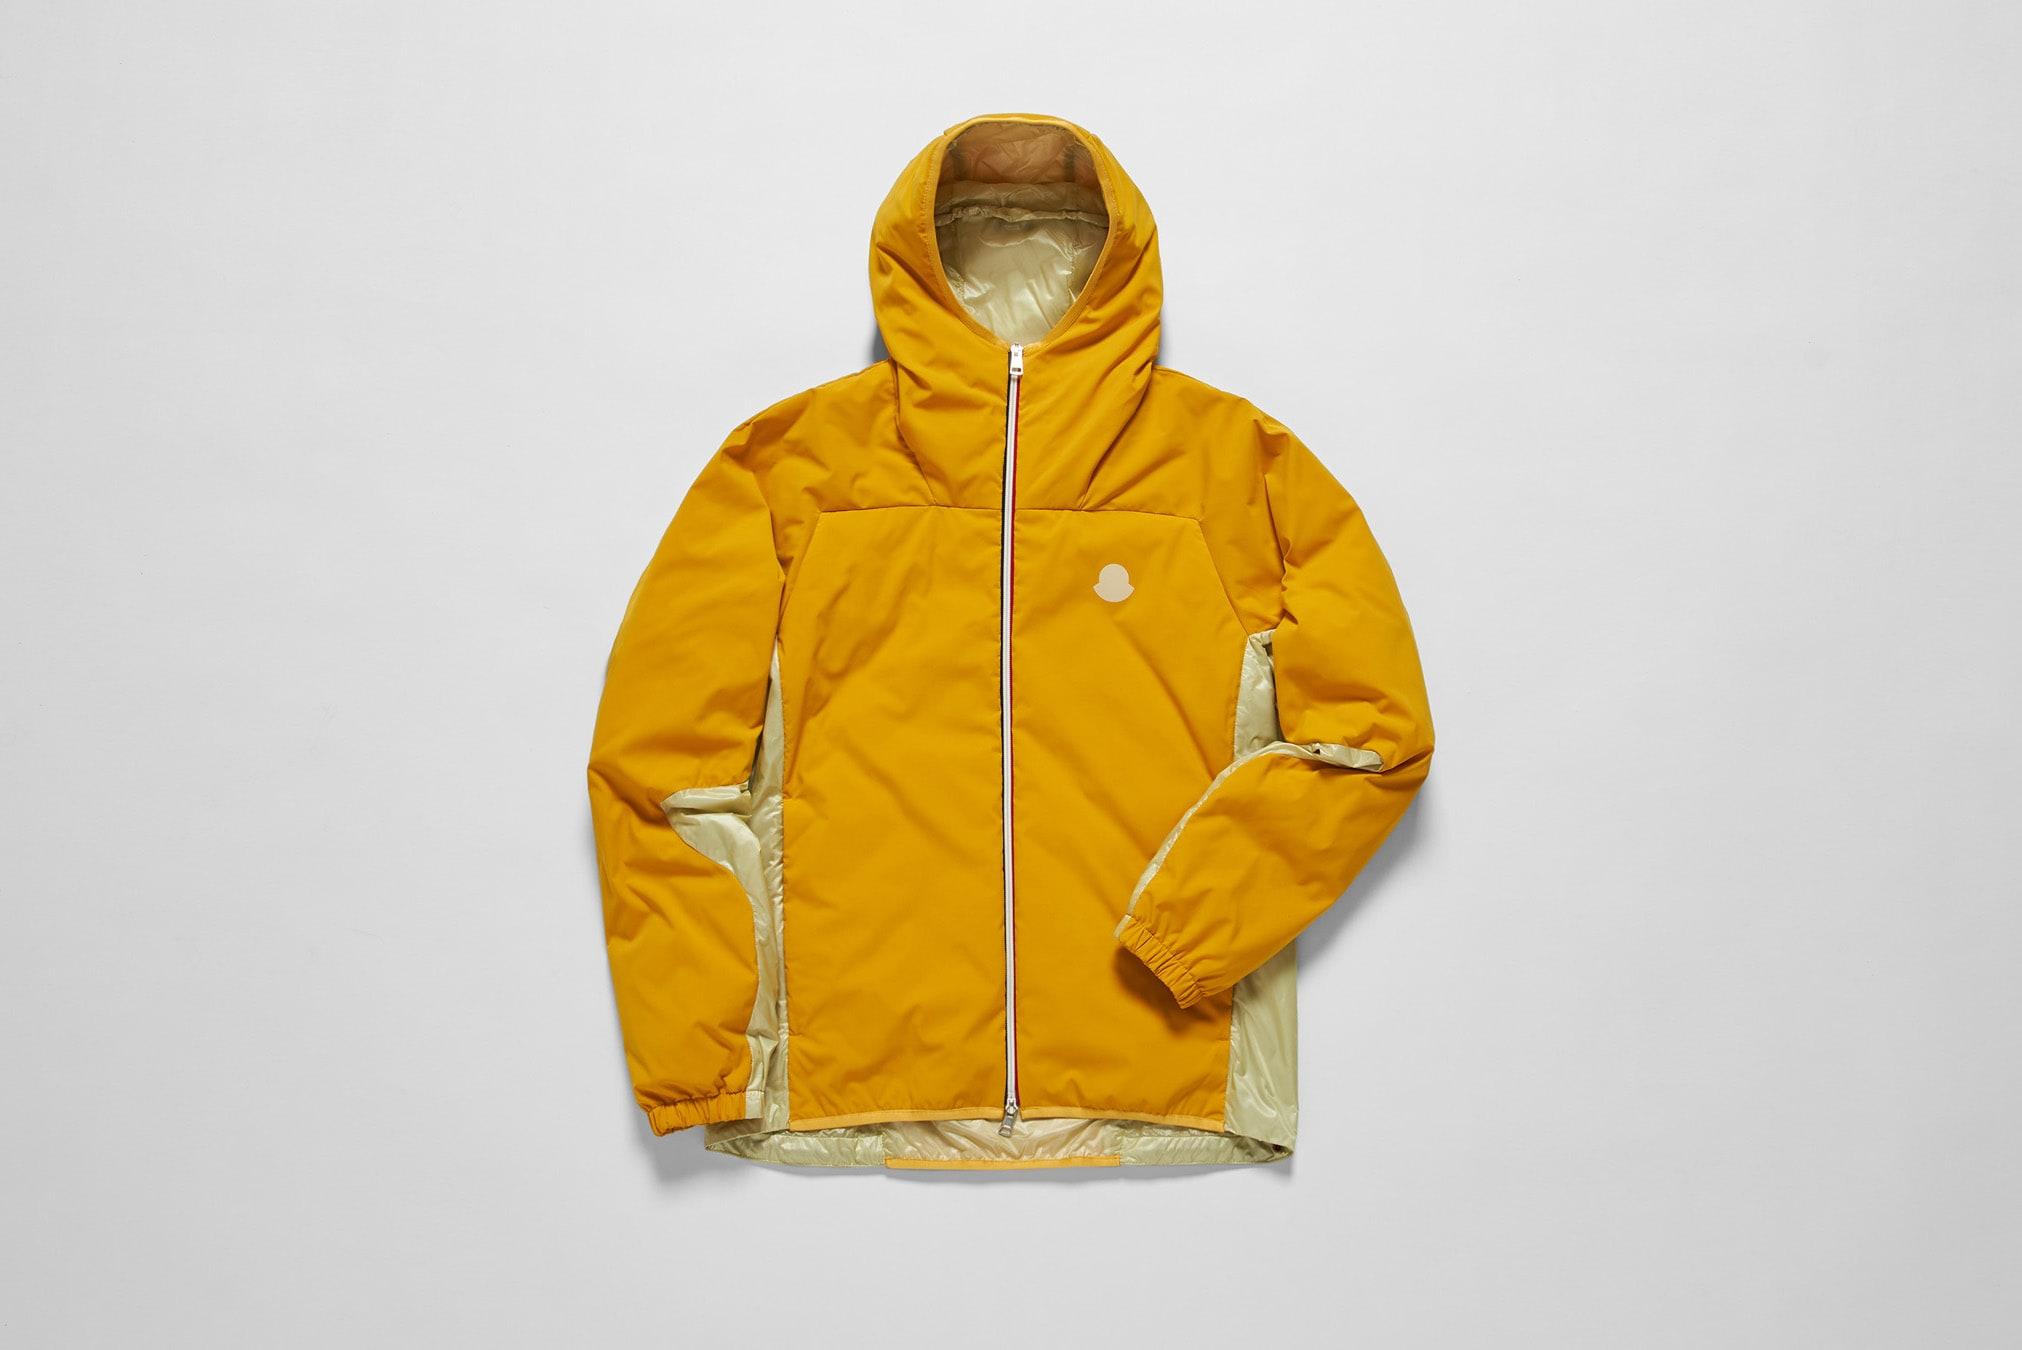 Moncler Genius 2 Moncler 1952 Hooded Jacket - END. Exclusive 1A539-M1137-14C